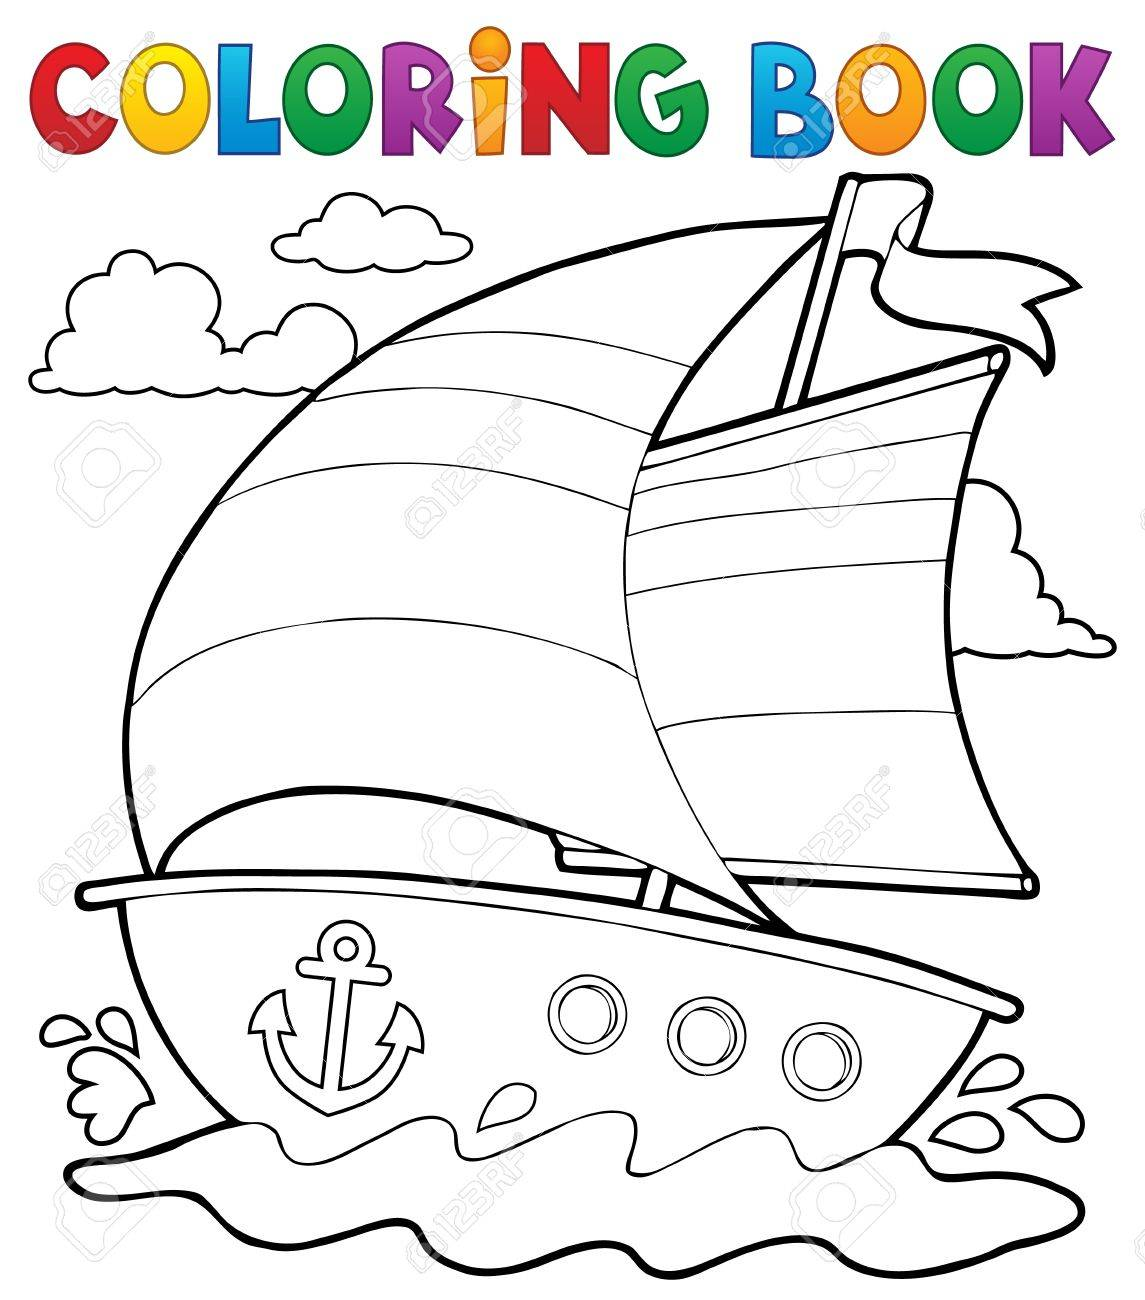 Libro Para Colorear Barco Náutico 1 Eps10 Ilustración Vectorial